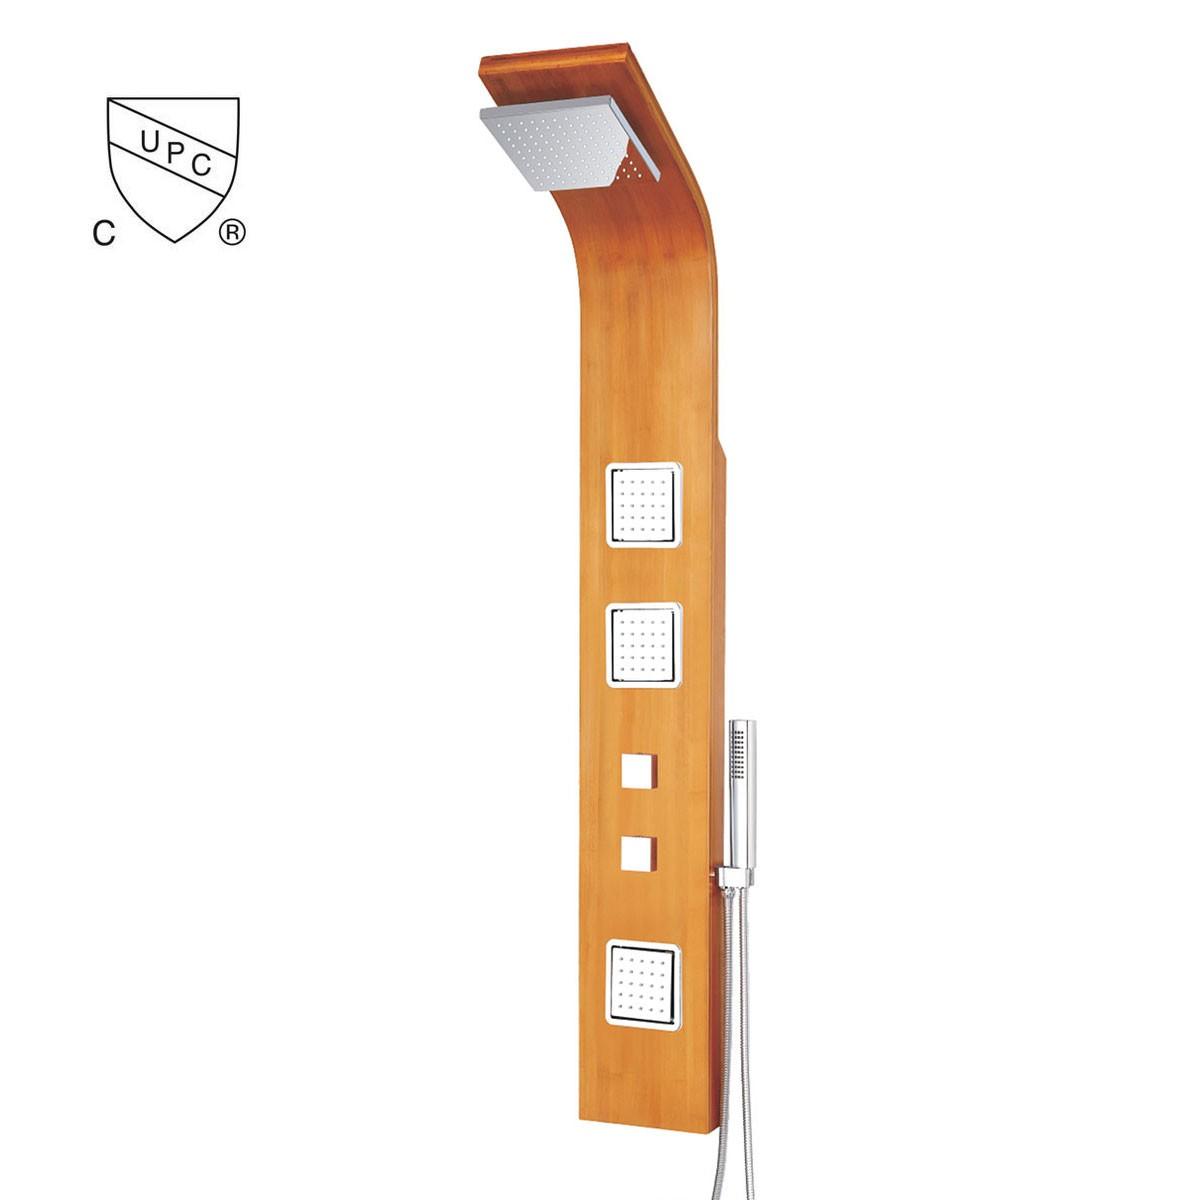 Natural Bamboo Wood Shower Panel System (DK-LYP-9302) | Decoraport ...